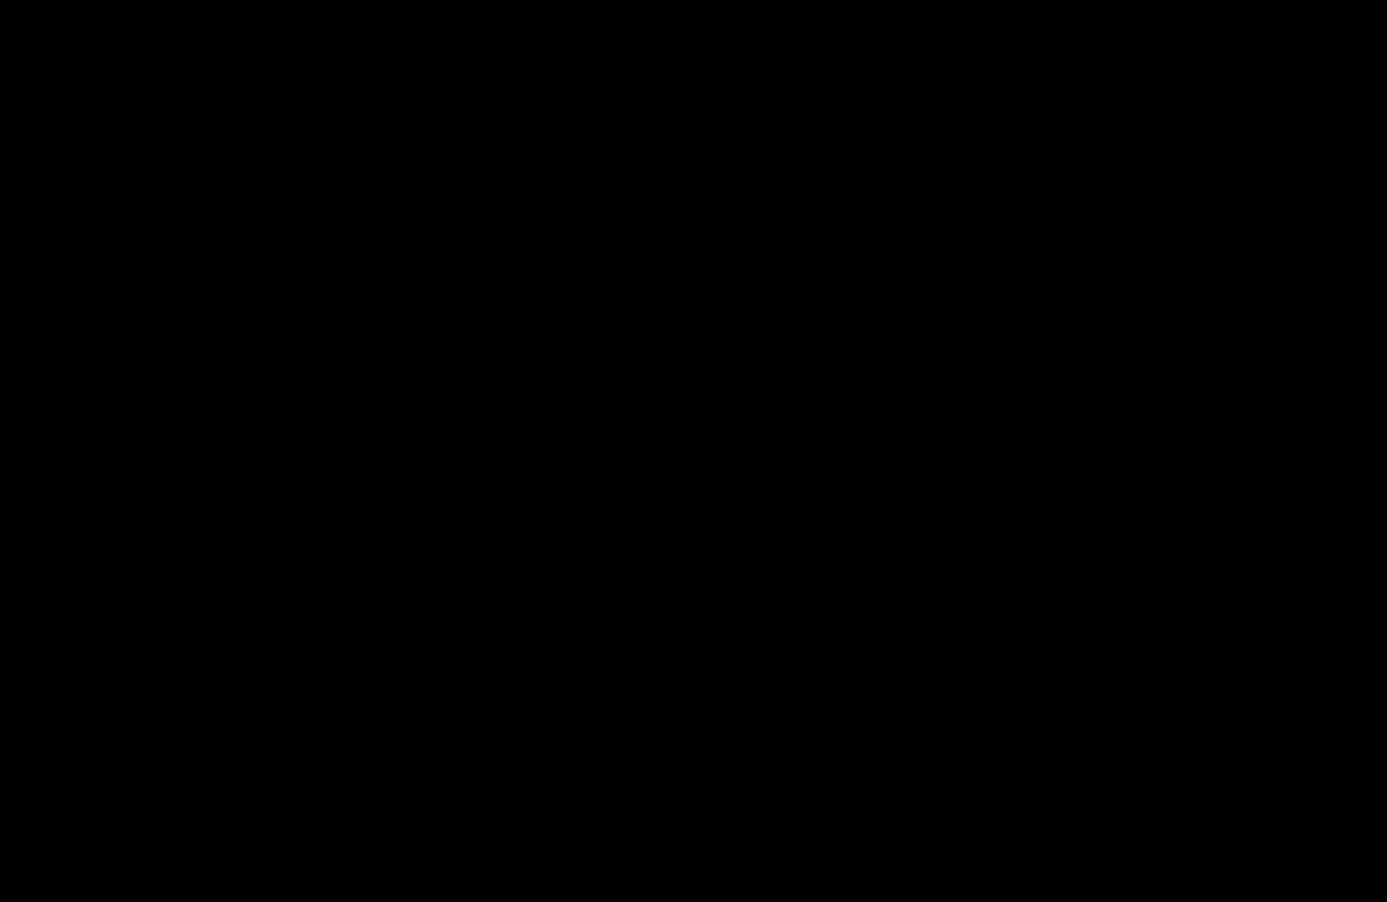 图片6.png-84.5kB